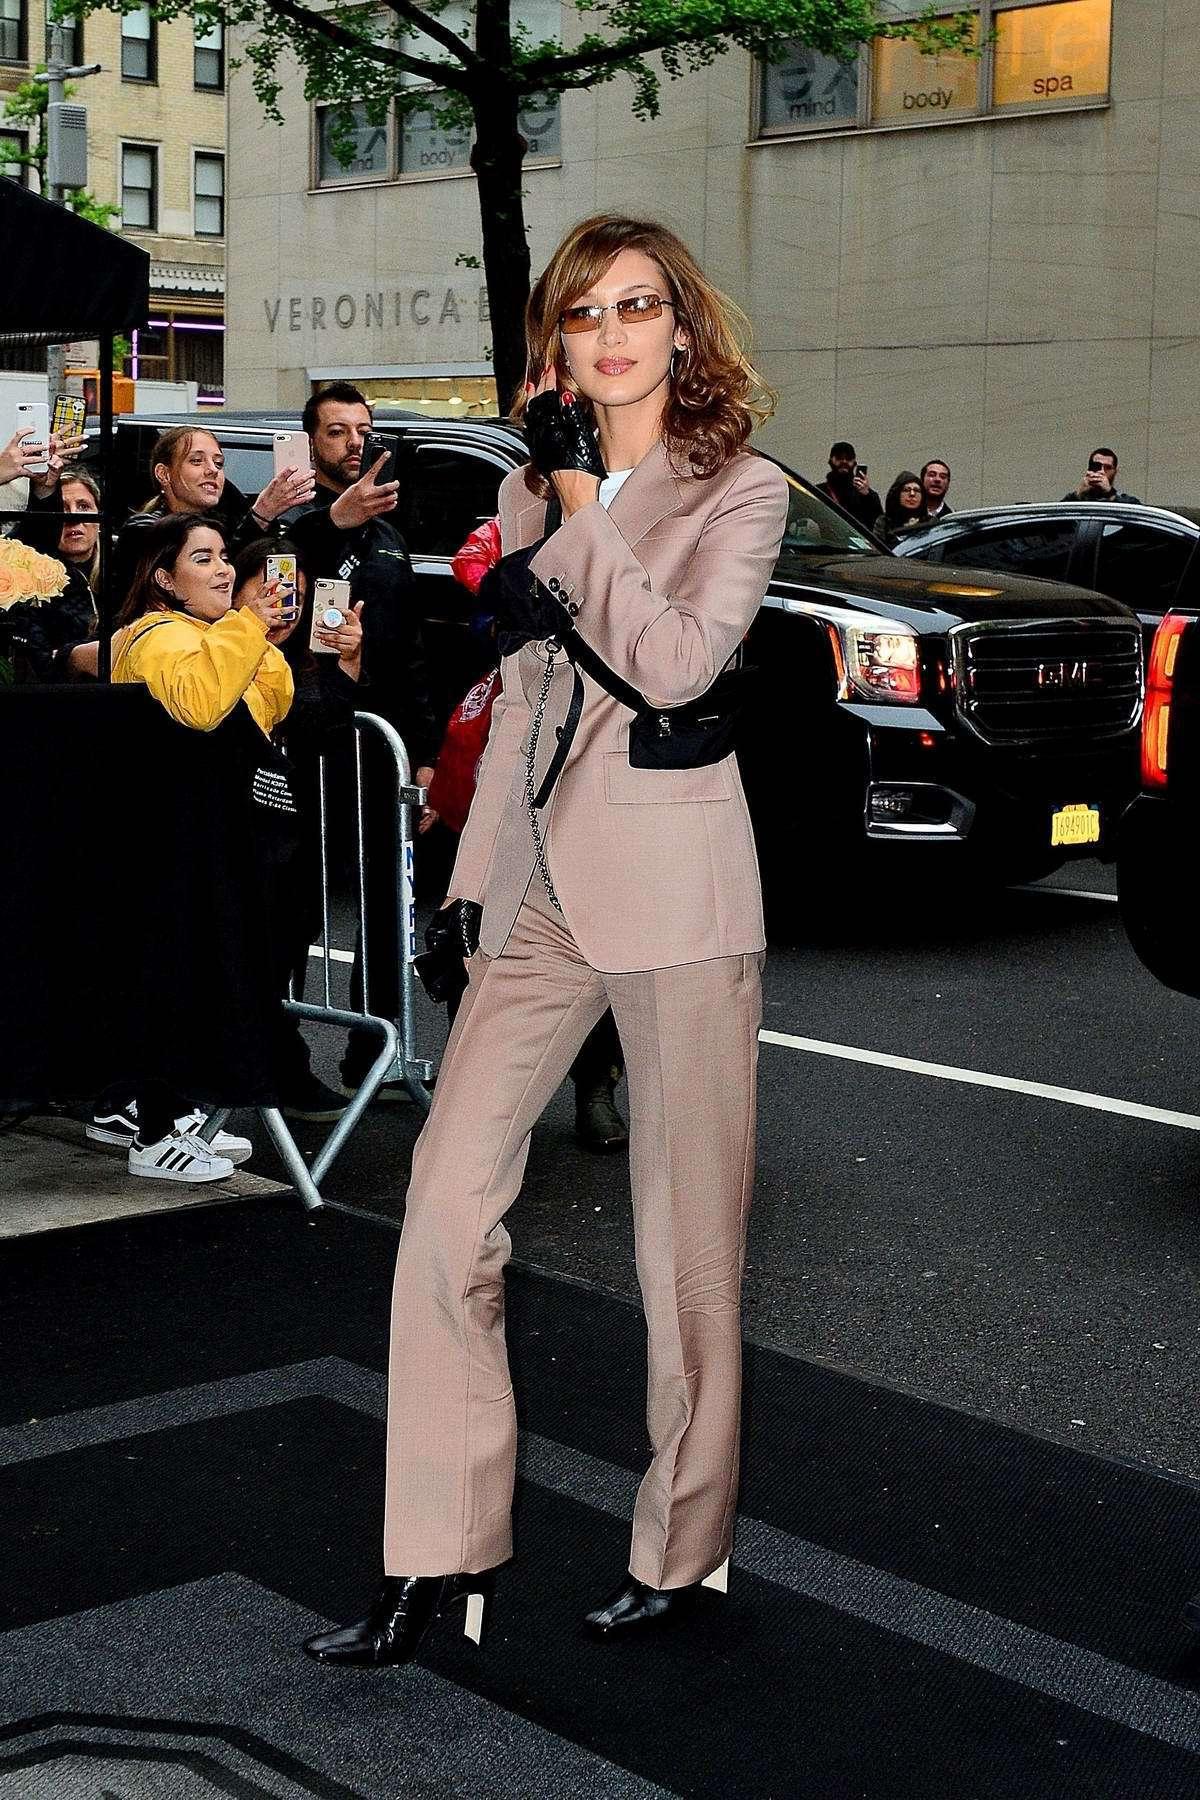 jacket bella hadid celebrity model off-duty suit pants